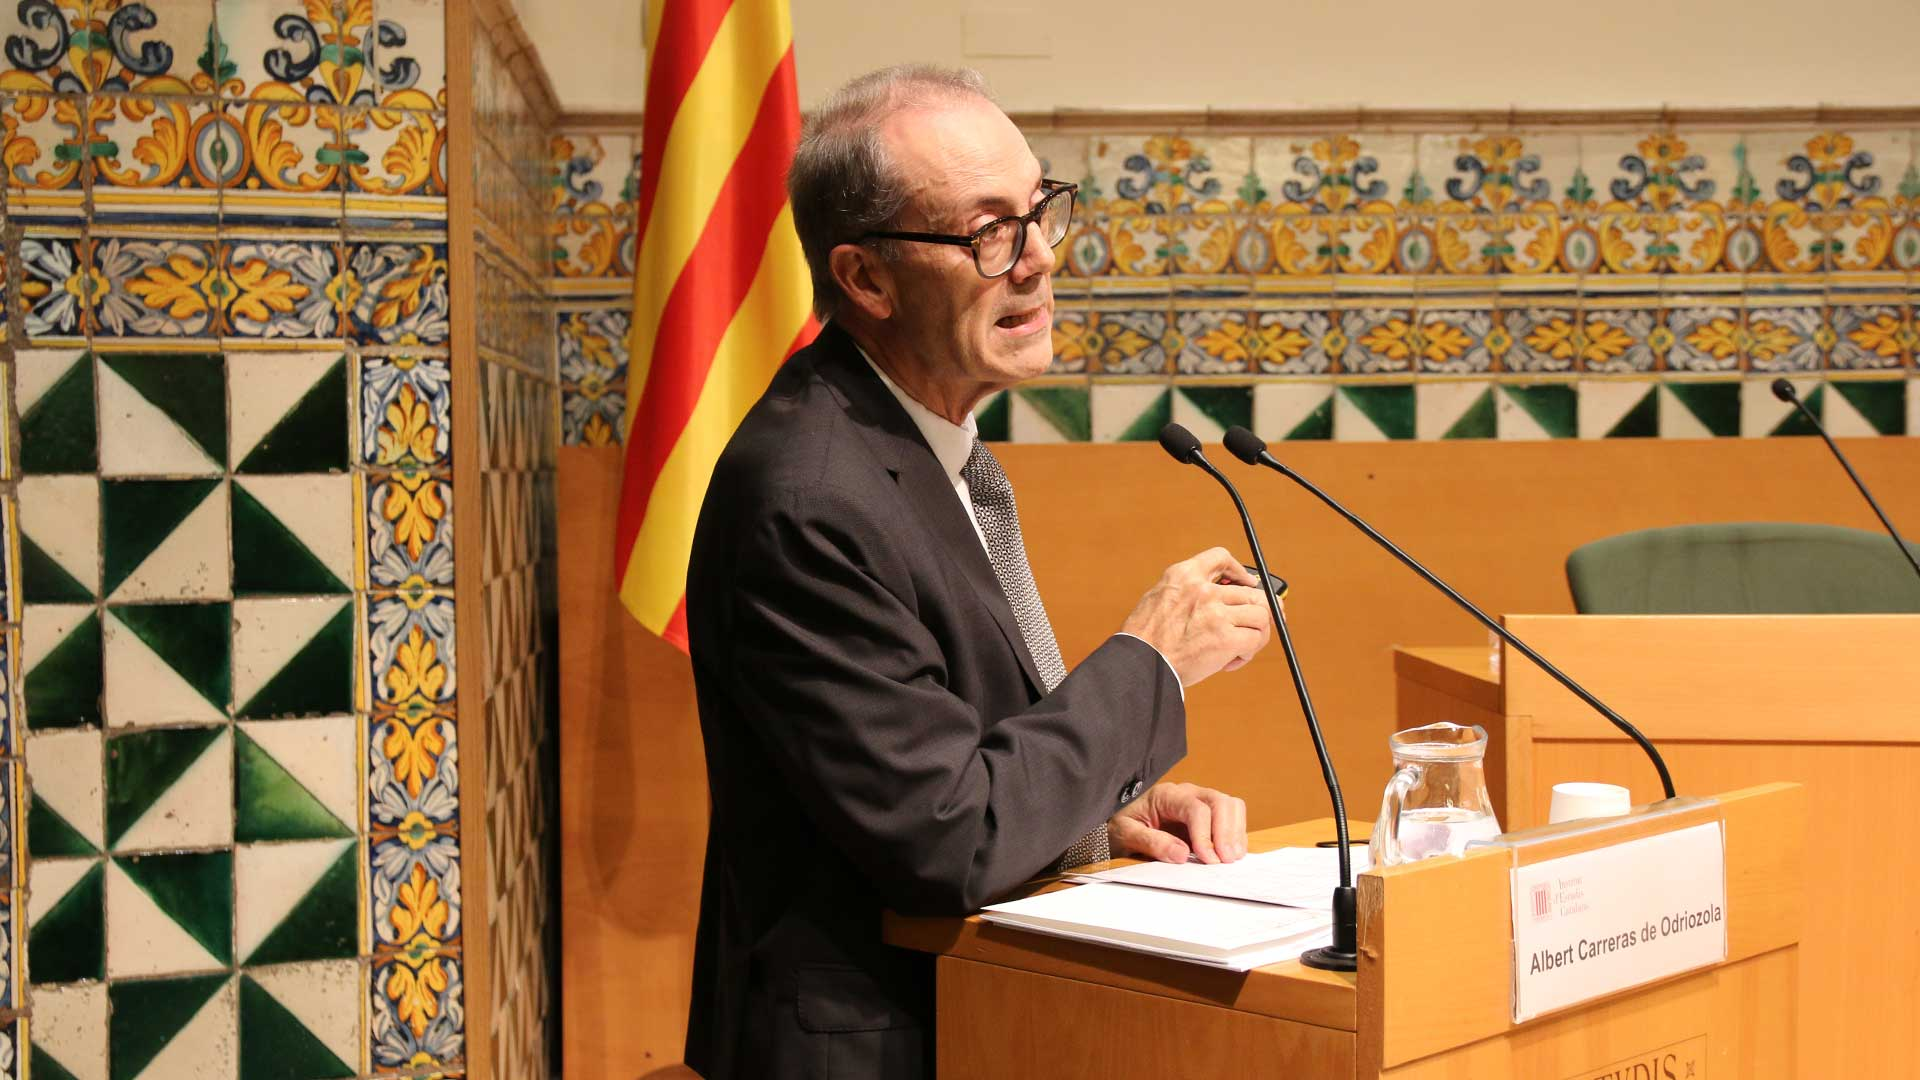 Albert Carreras economia catalana